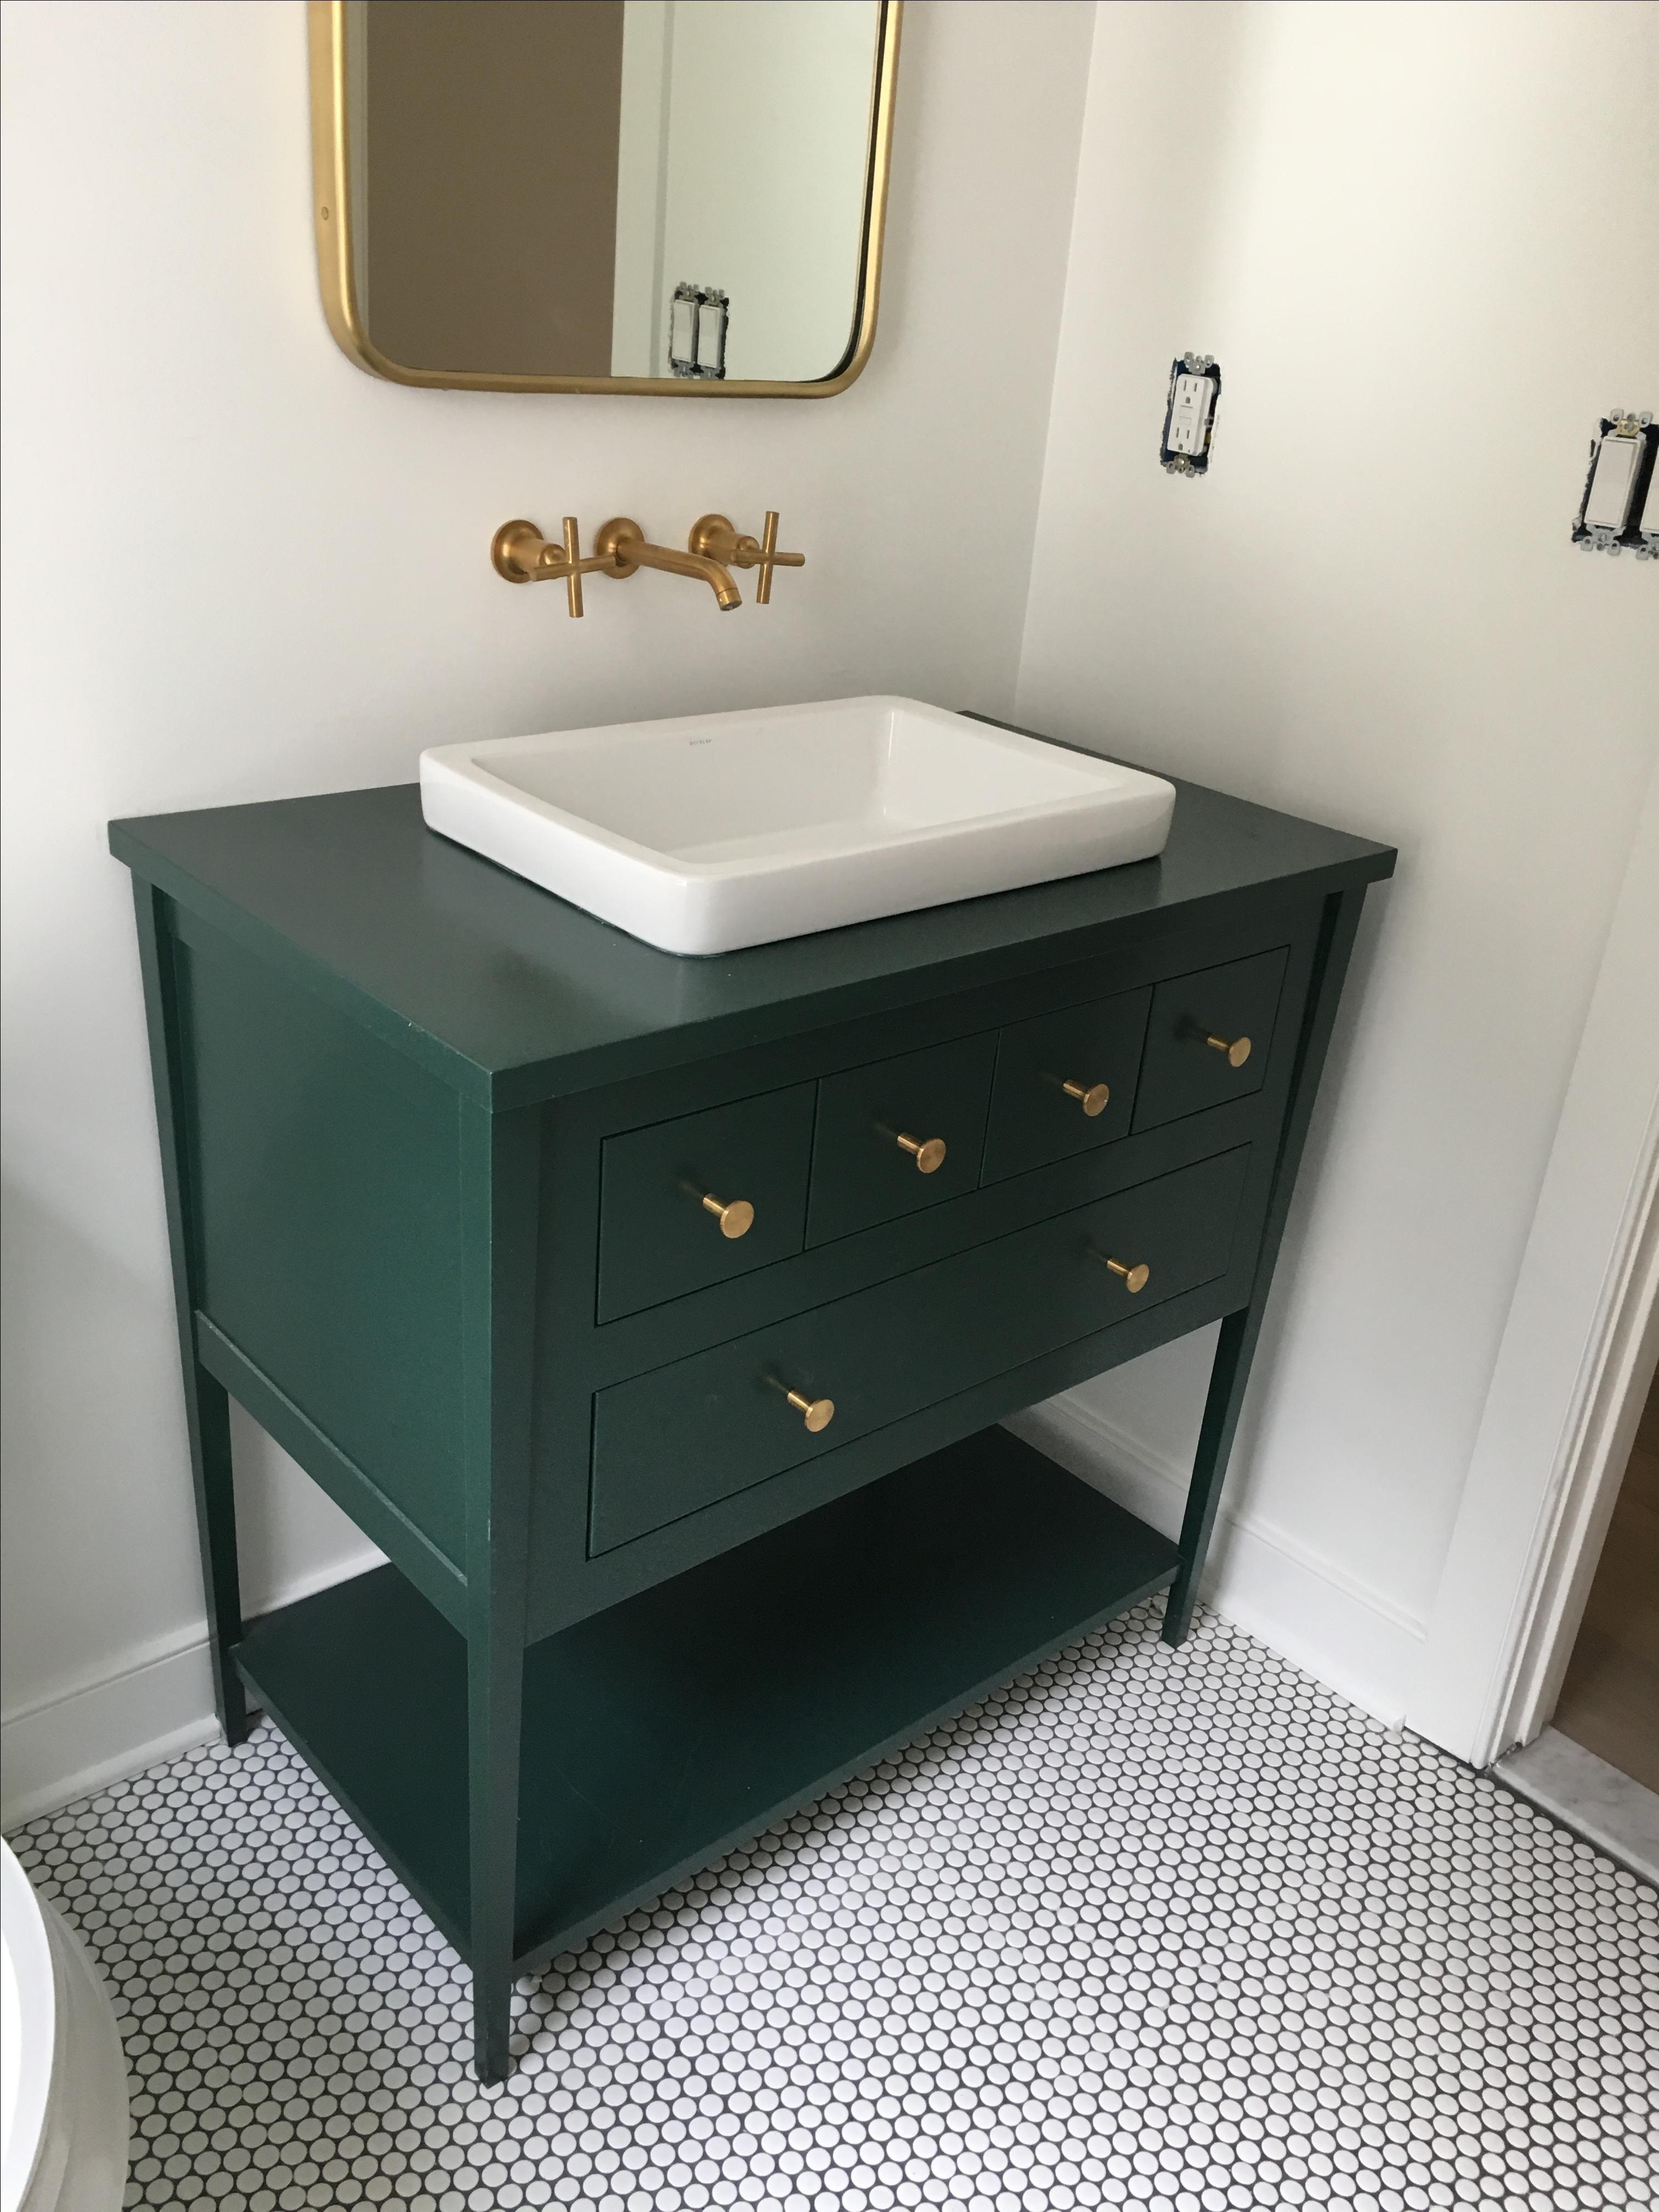 Image Result For Bathroom With Green Vanity Green Vanity Green